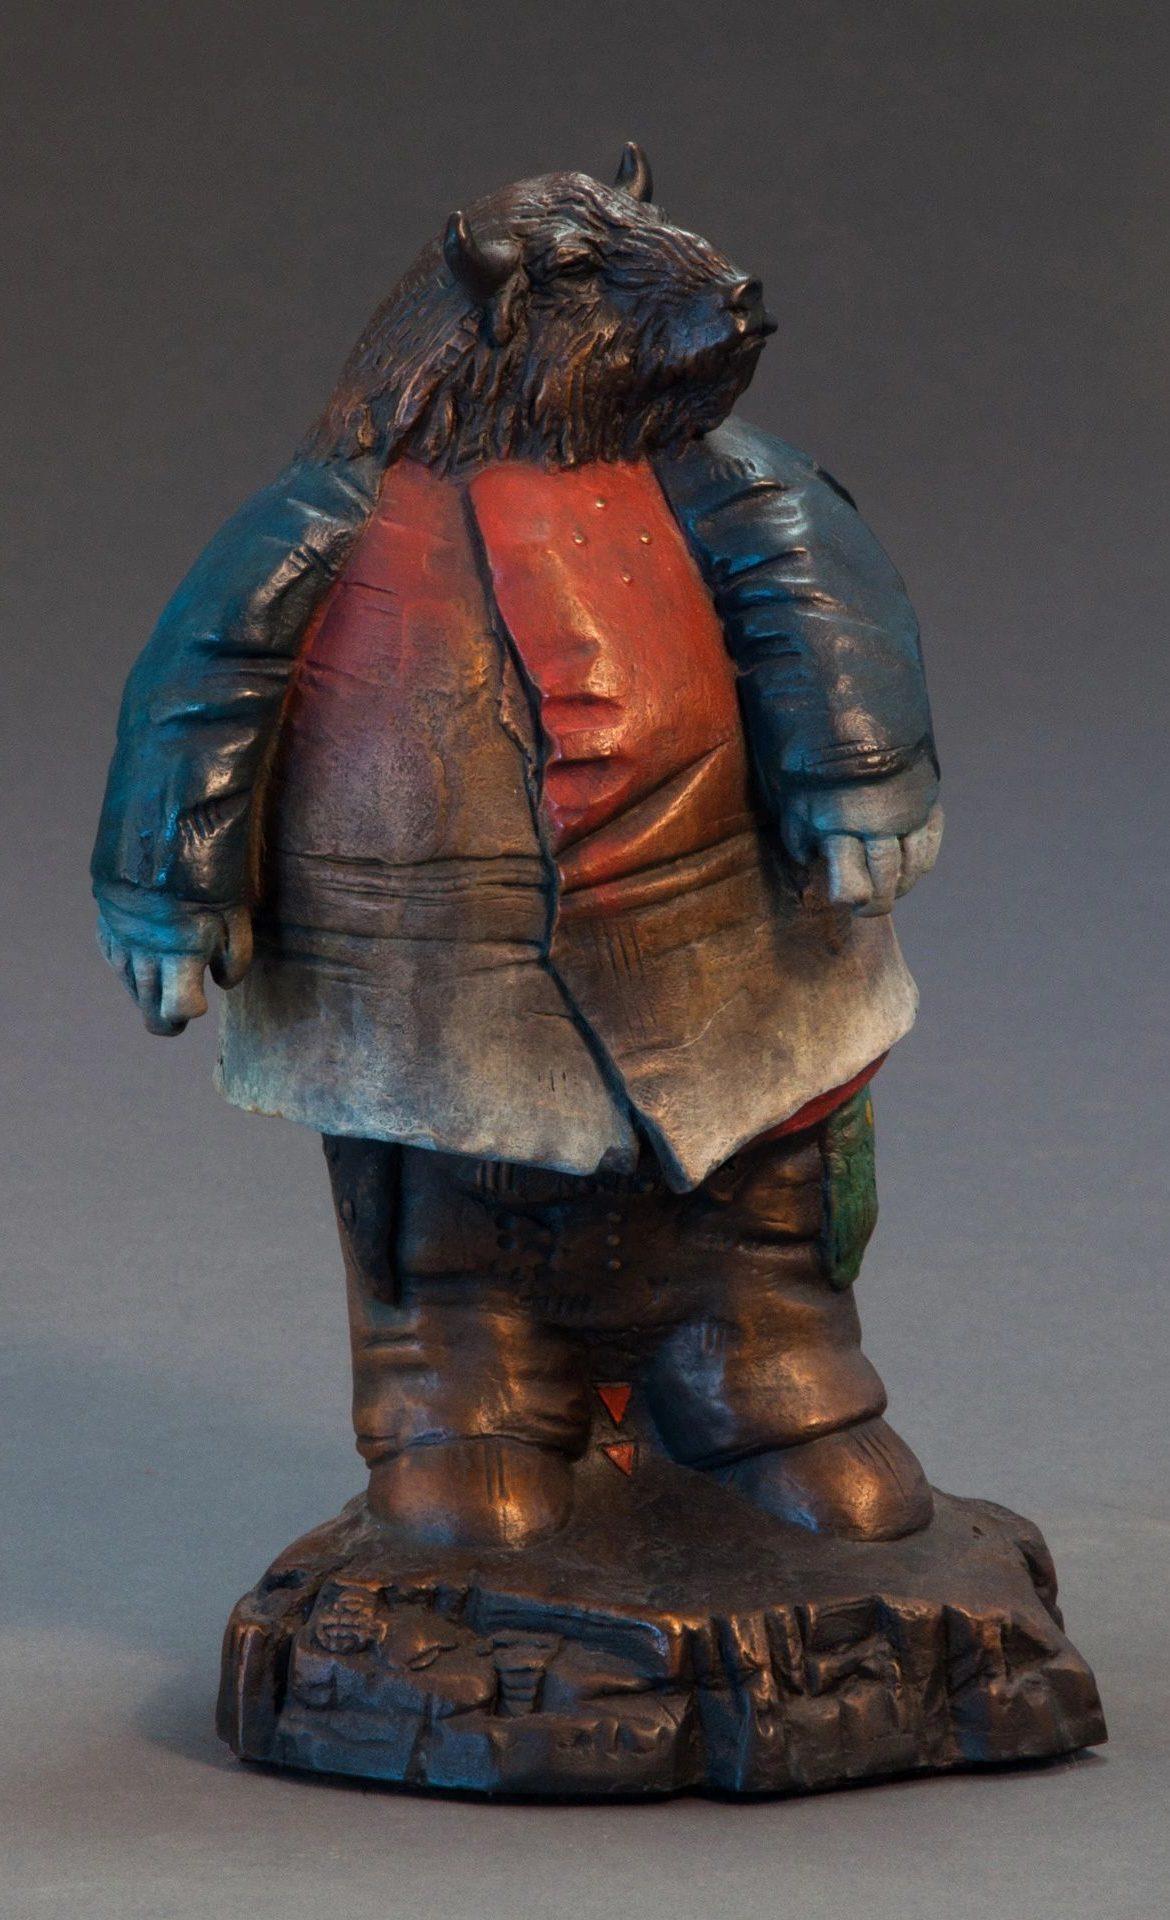 Trust in Might, Brubaker, Bronze Sculpture, Rogoway Gallery